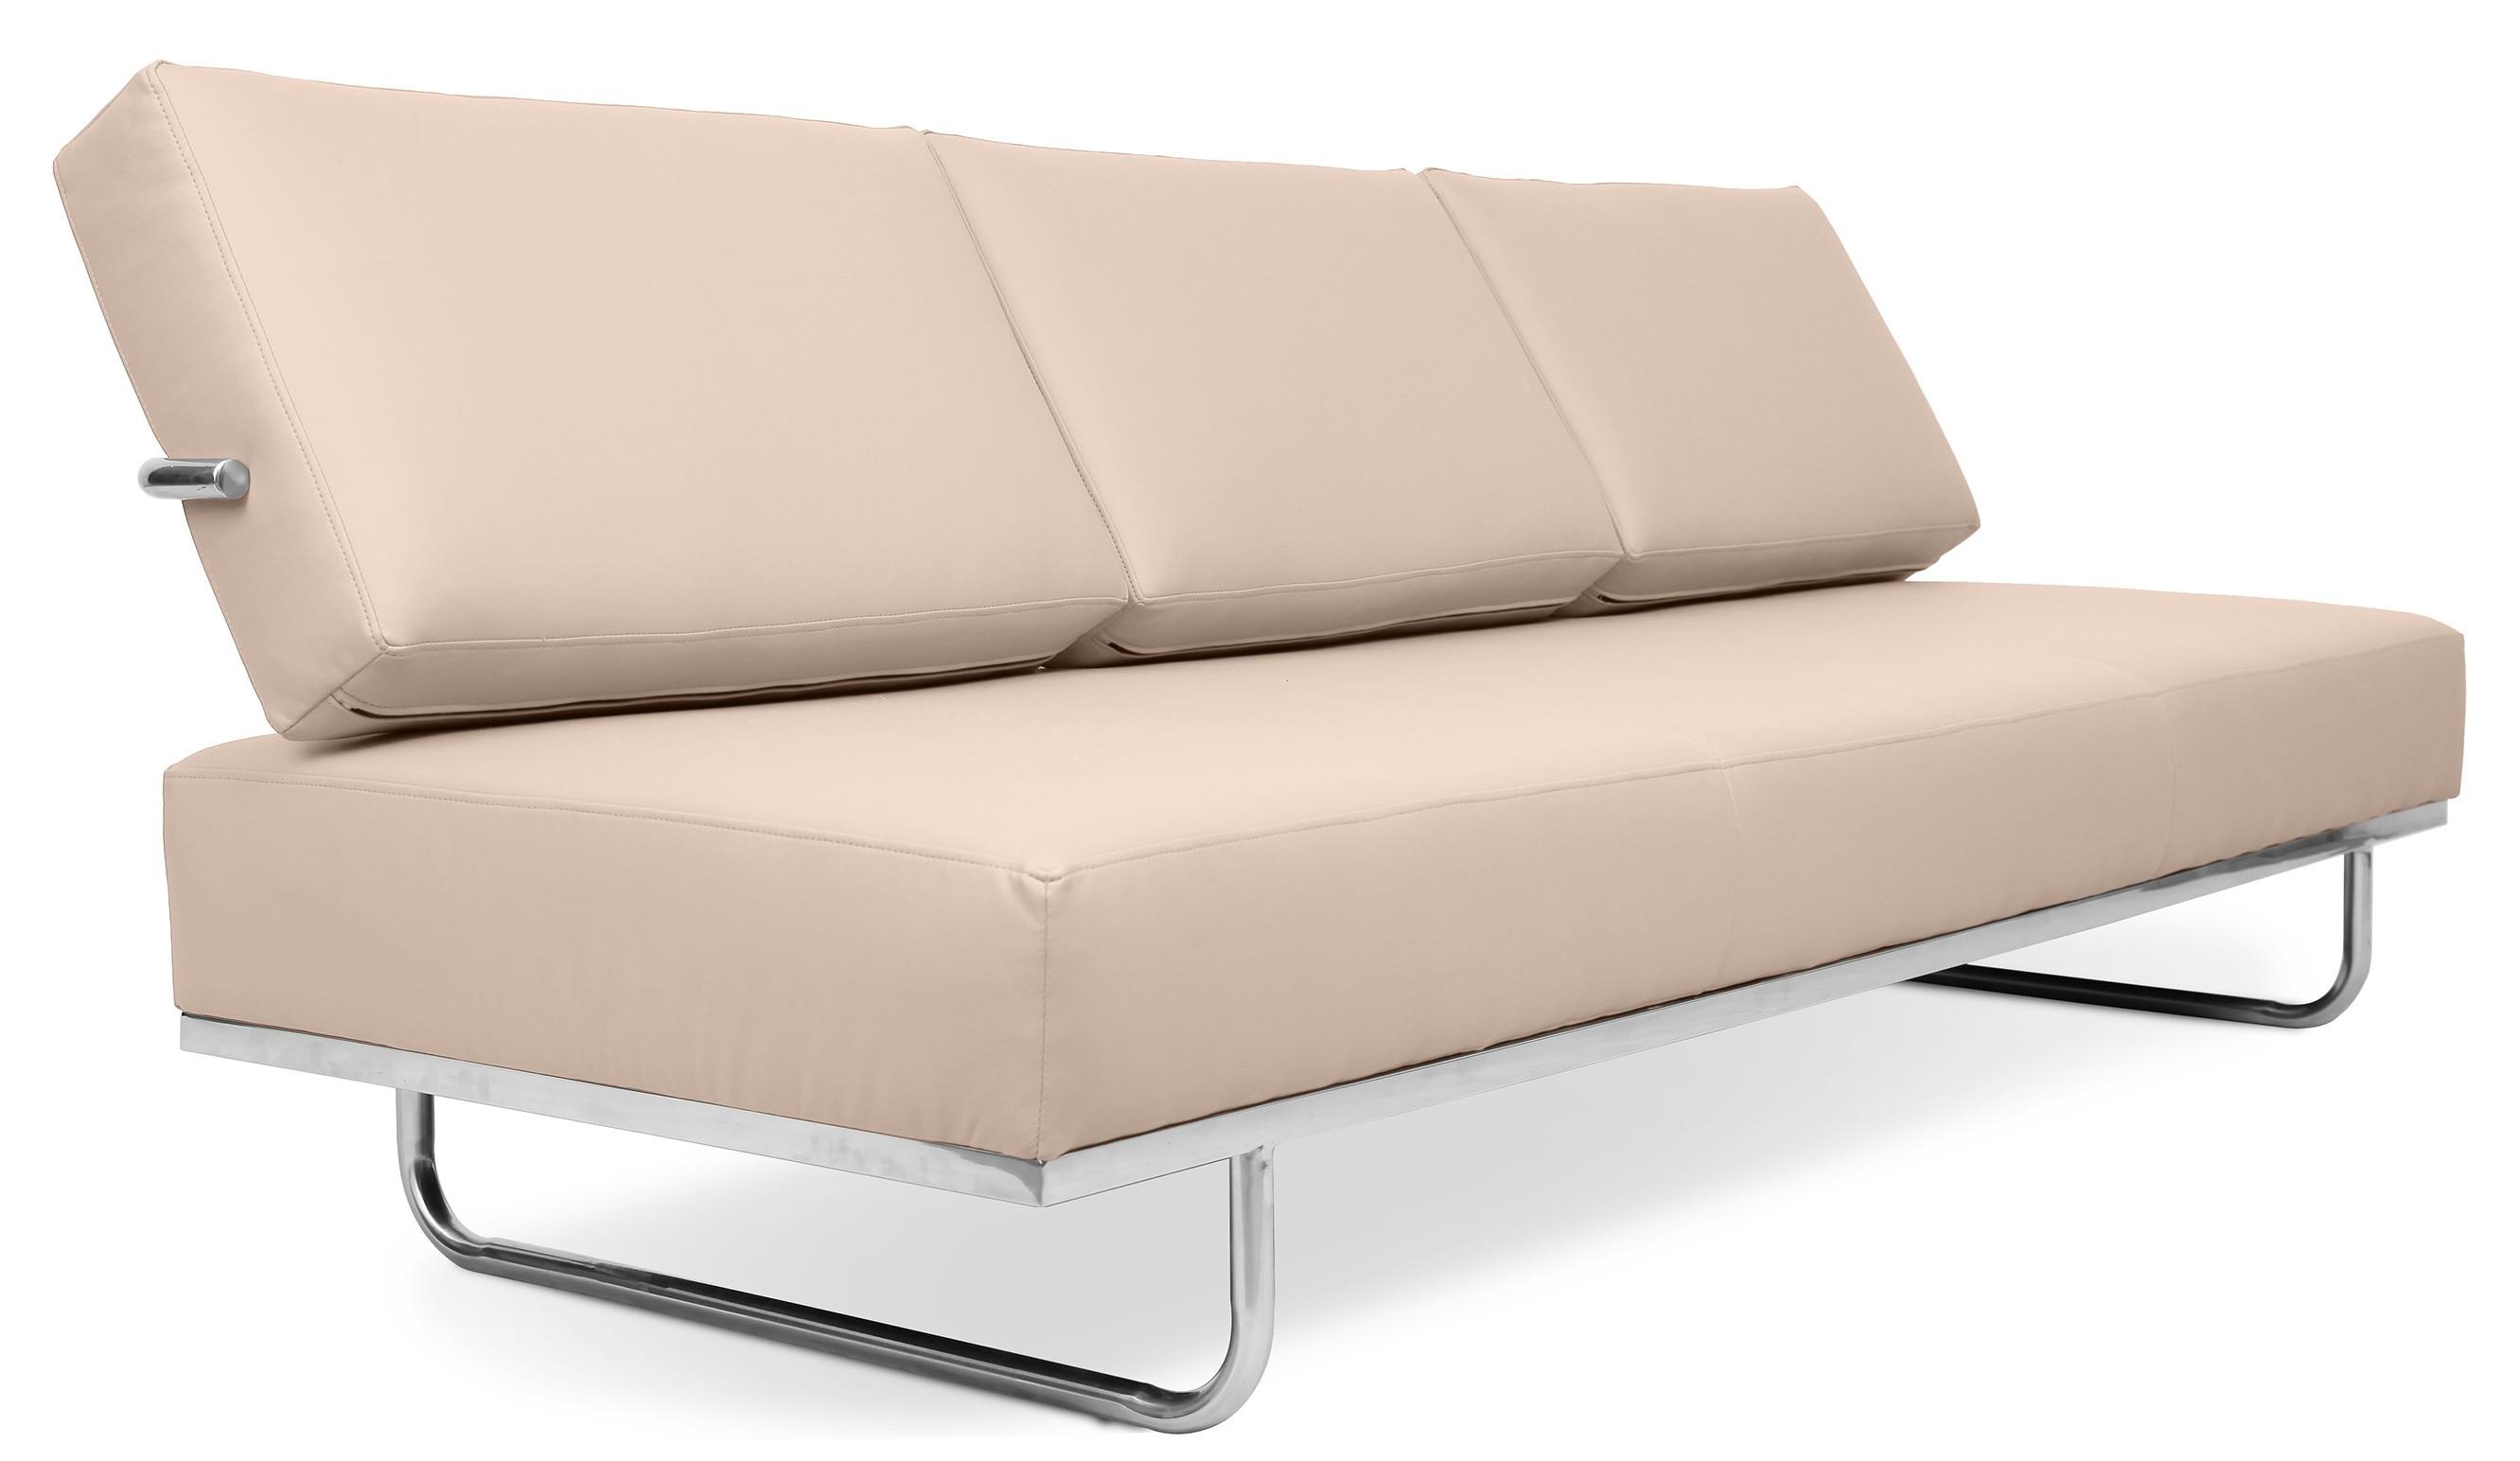 canap lit 3 places cuir ivoire carter. Black Bedroom Furniture Sets. Home Design Ideas